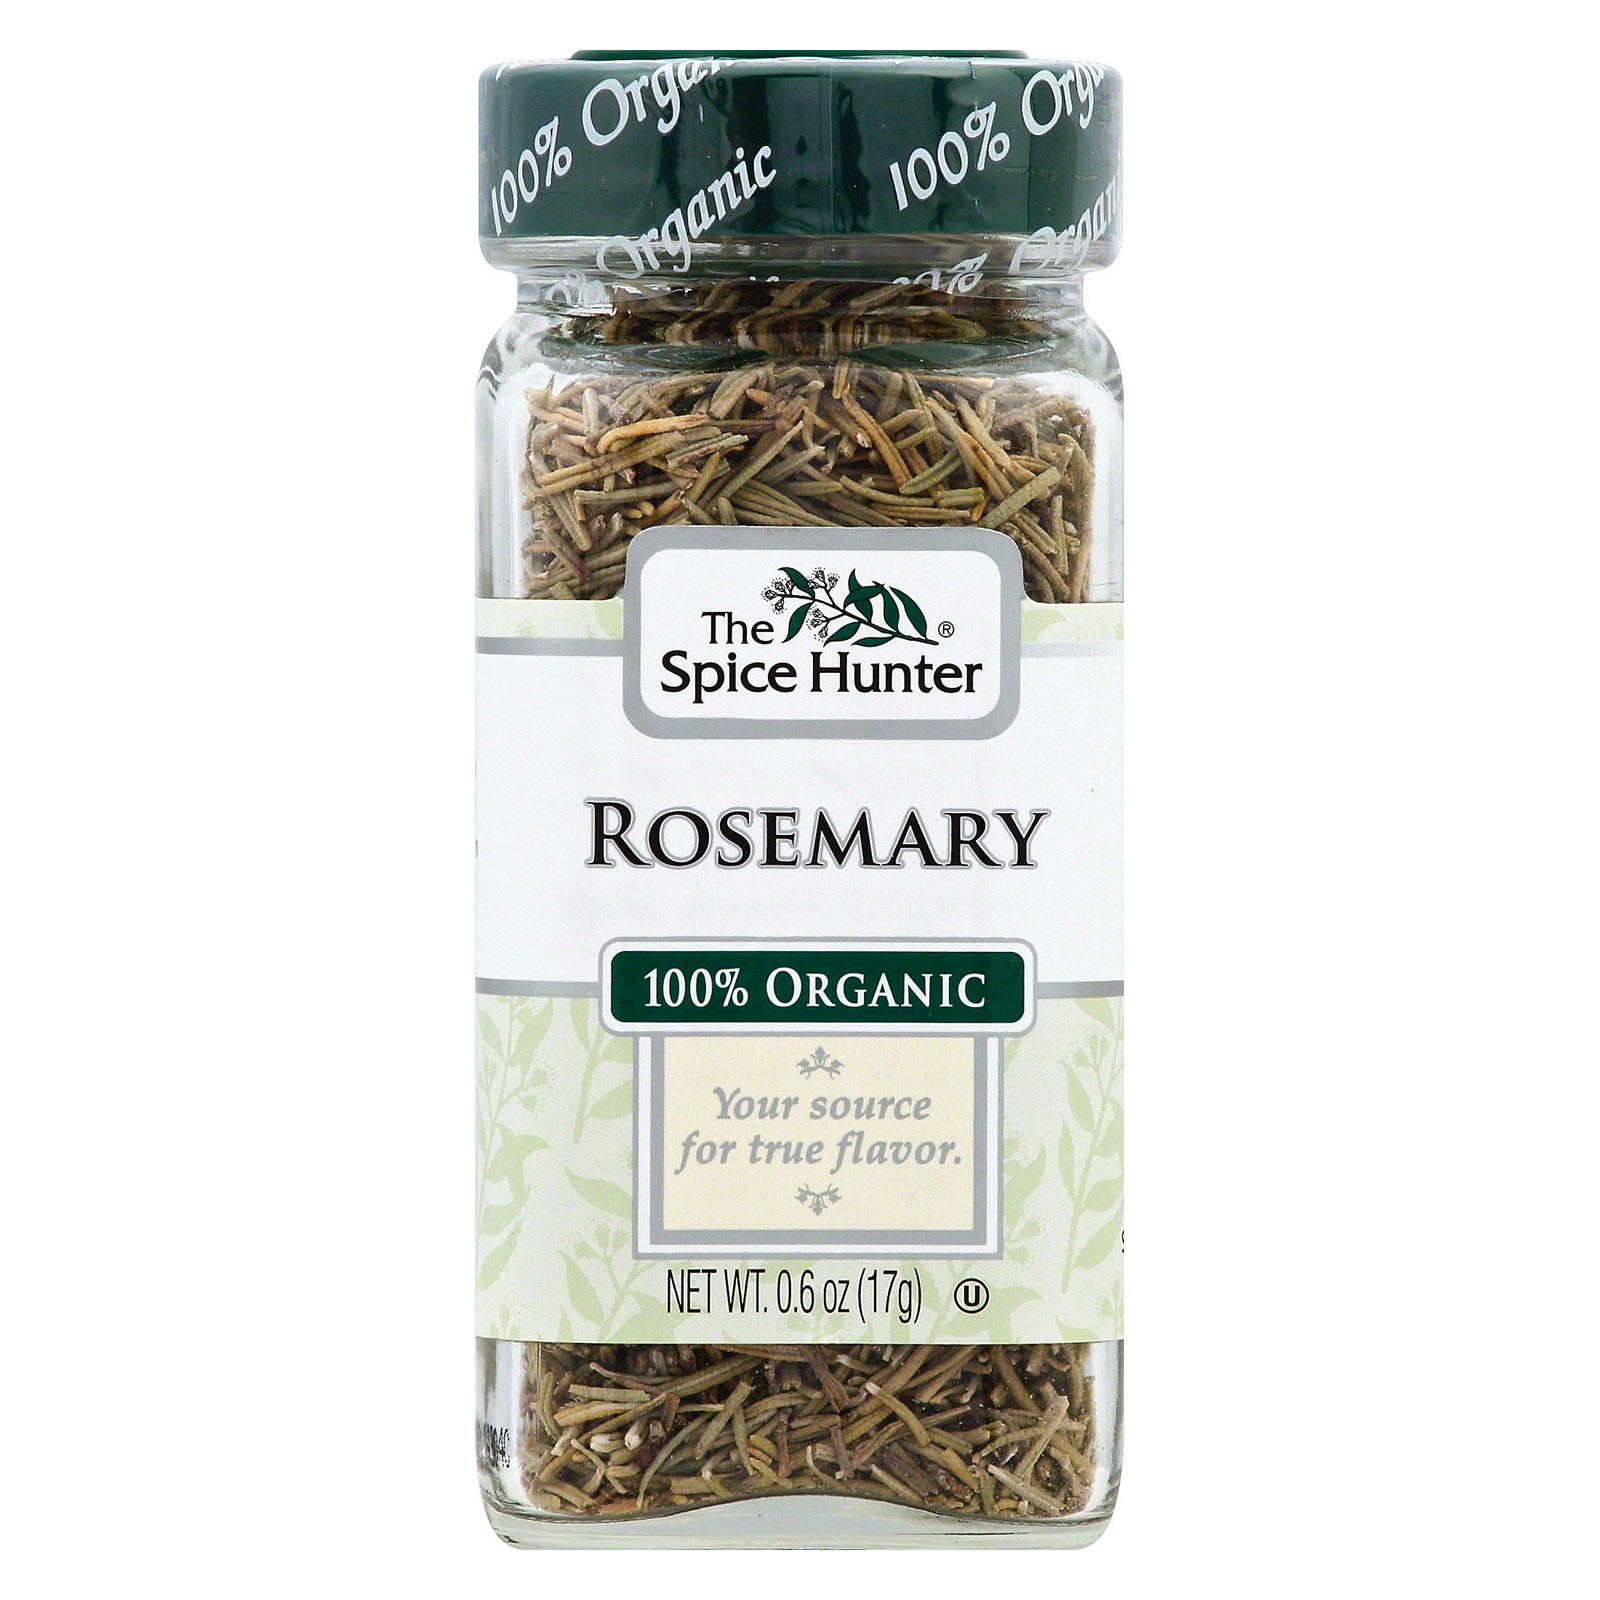 Spice Hunter 100% Organic Spice - Rosemary - Case of 6 - .6 oz